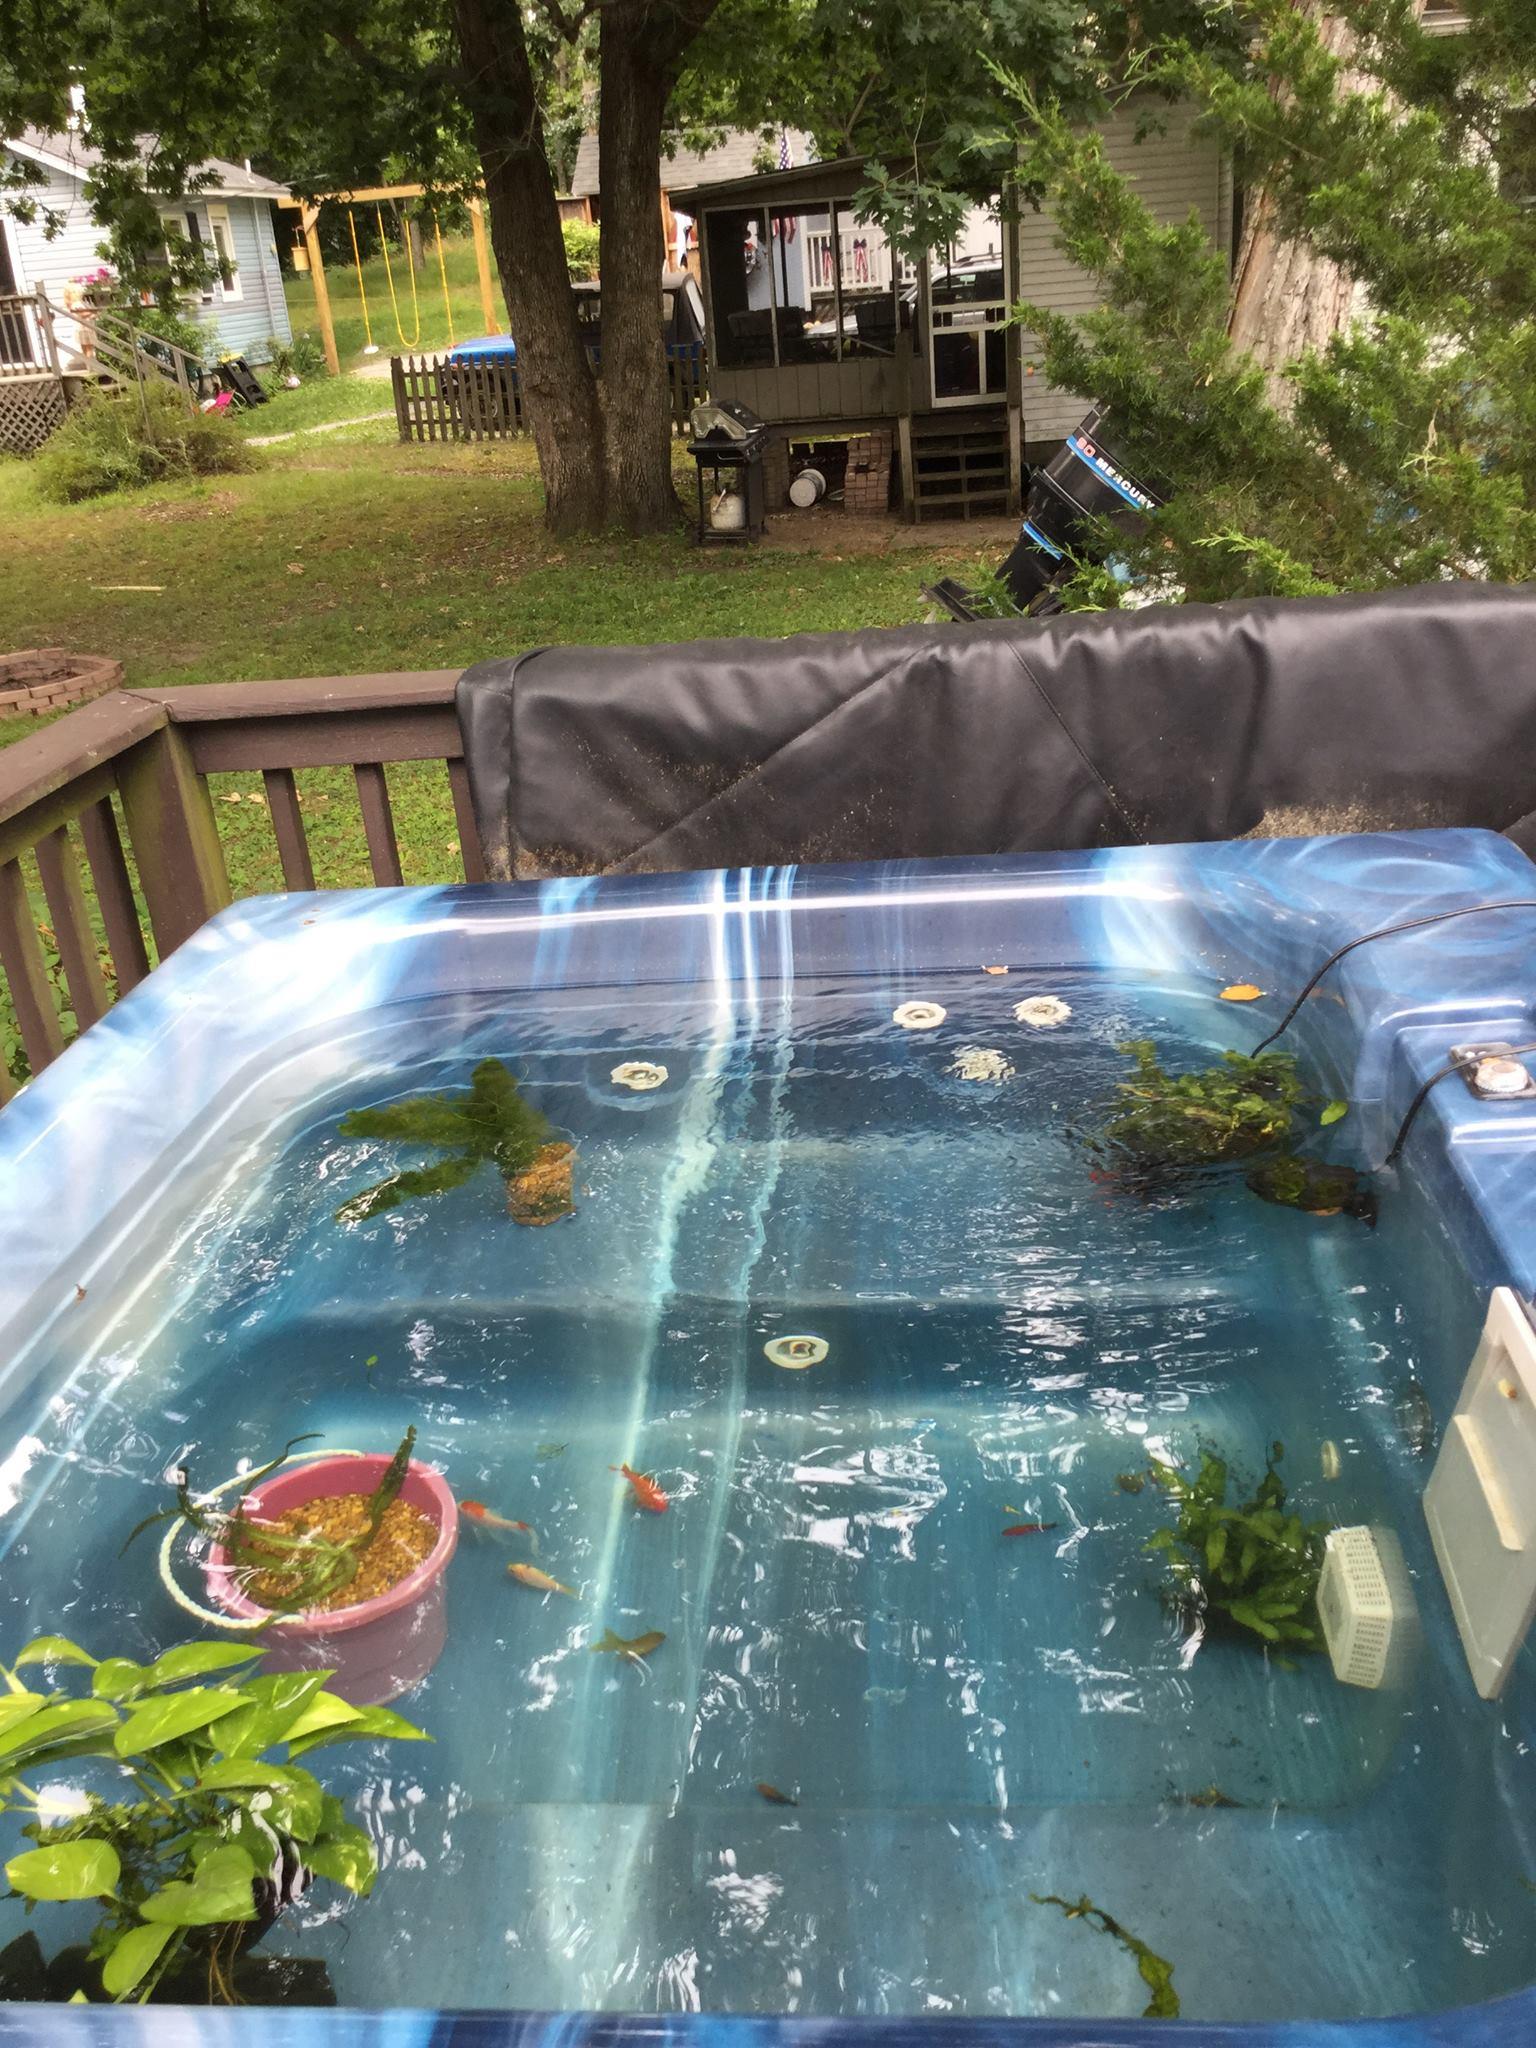 Converted Our Broken Hot Tub Into A Goldfish Pond Aquariums